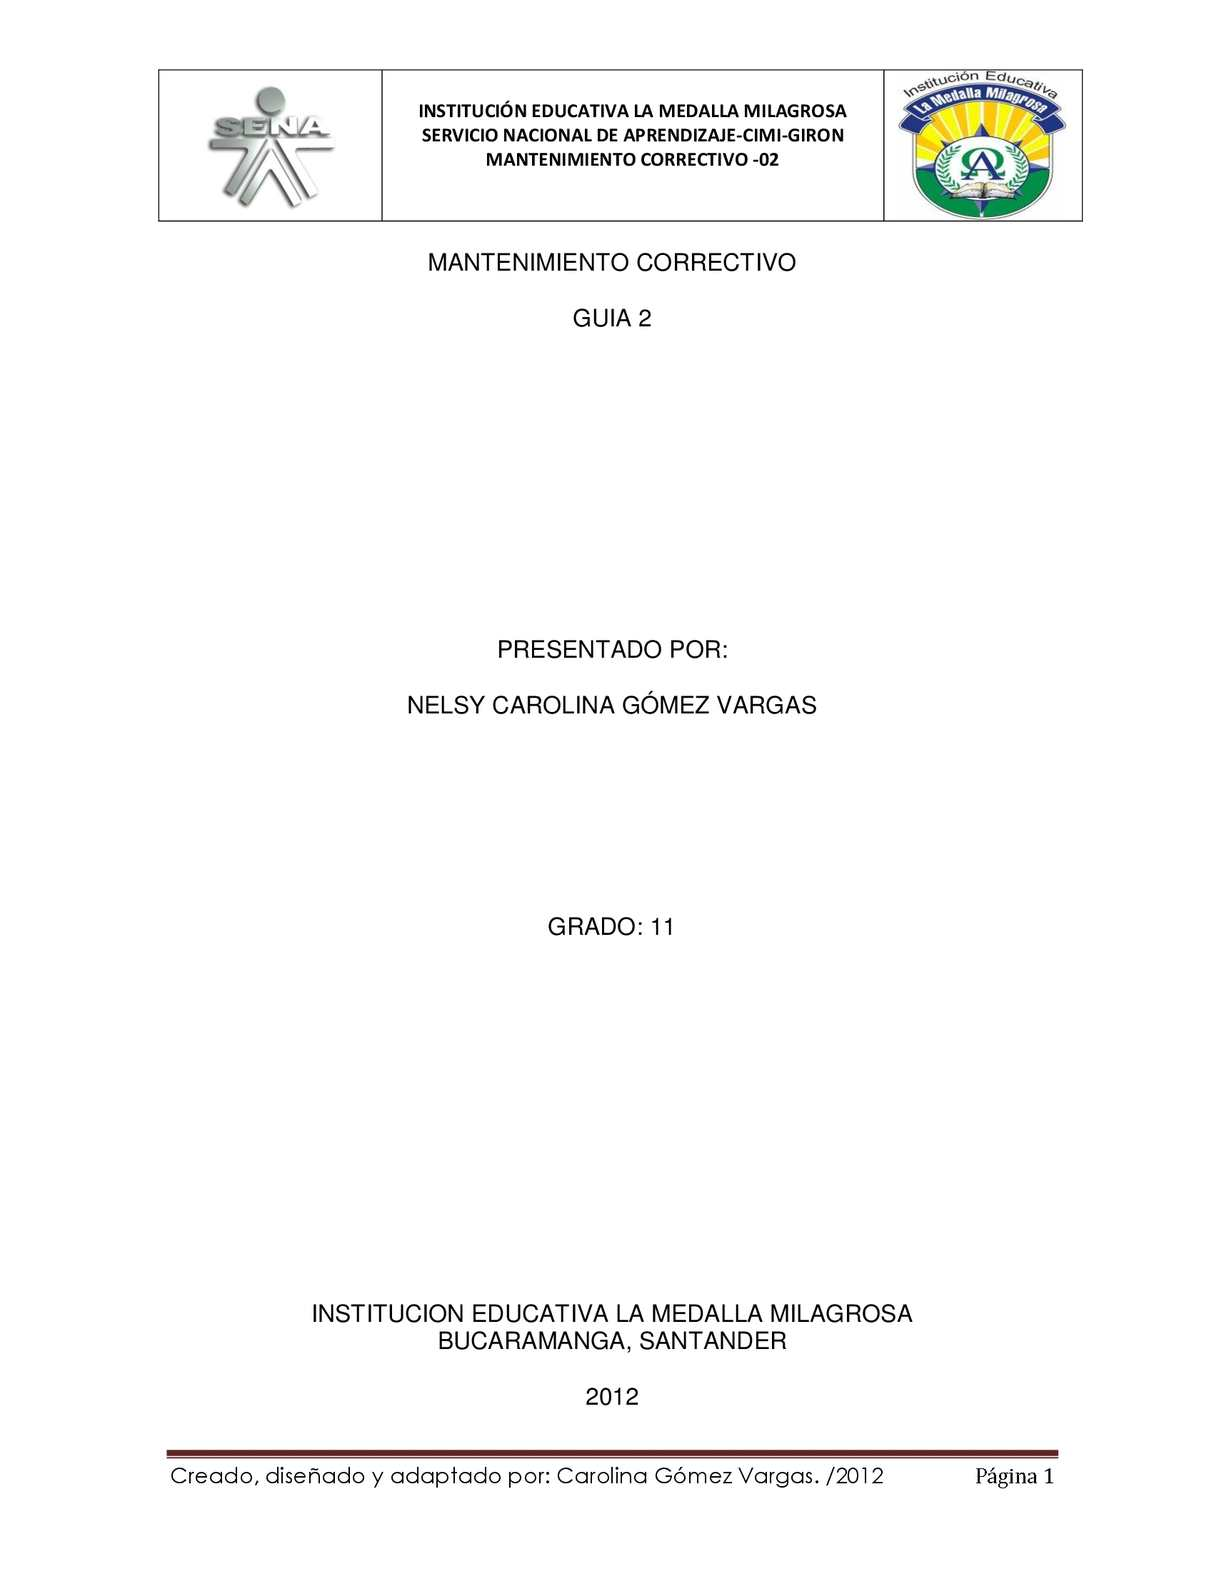 GUÍA 2 MANTENIMIENTO CORRECTIVO